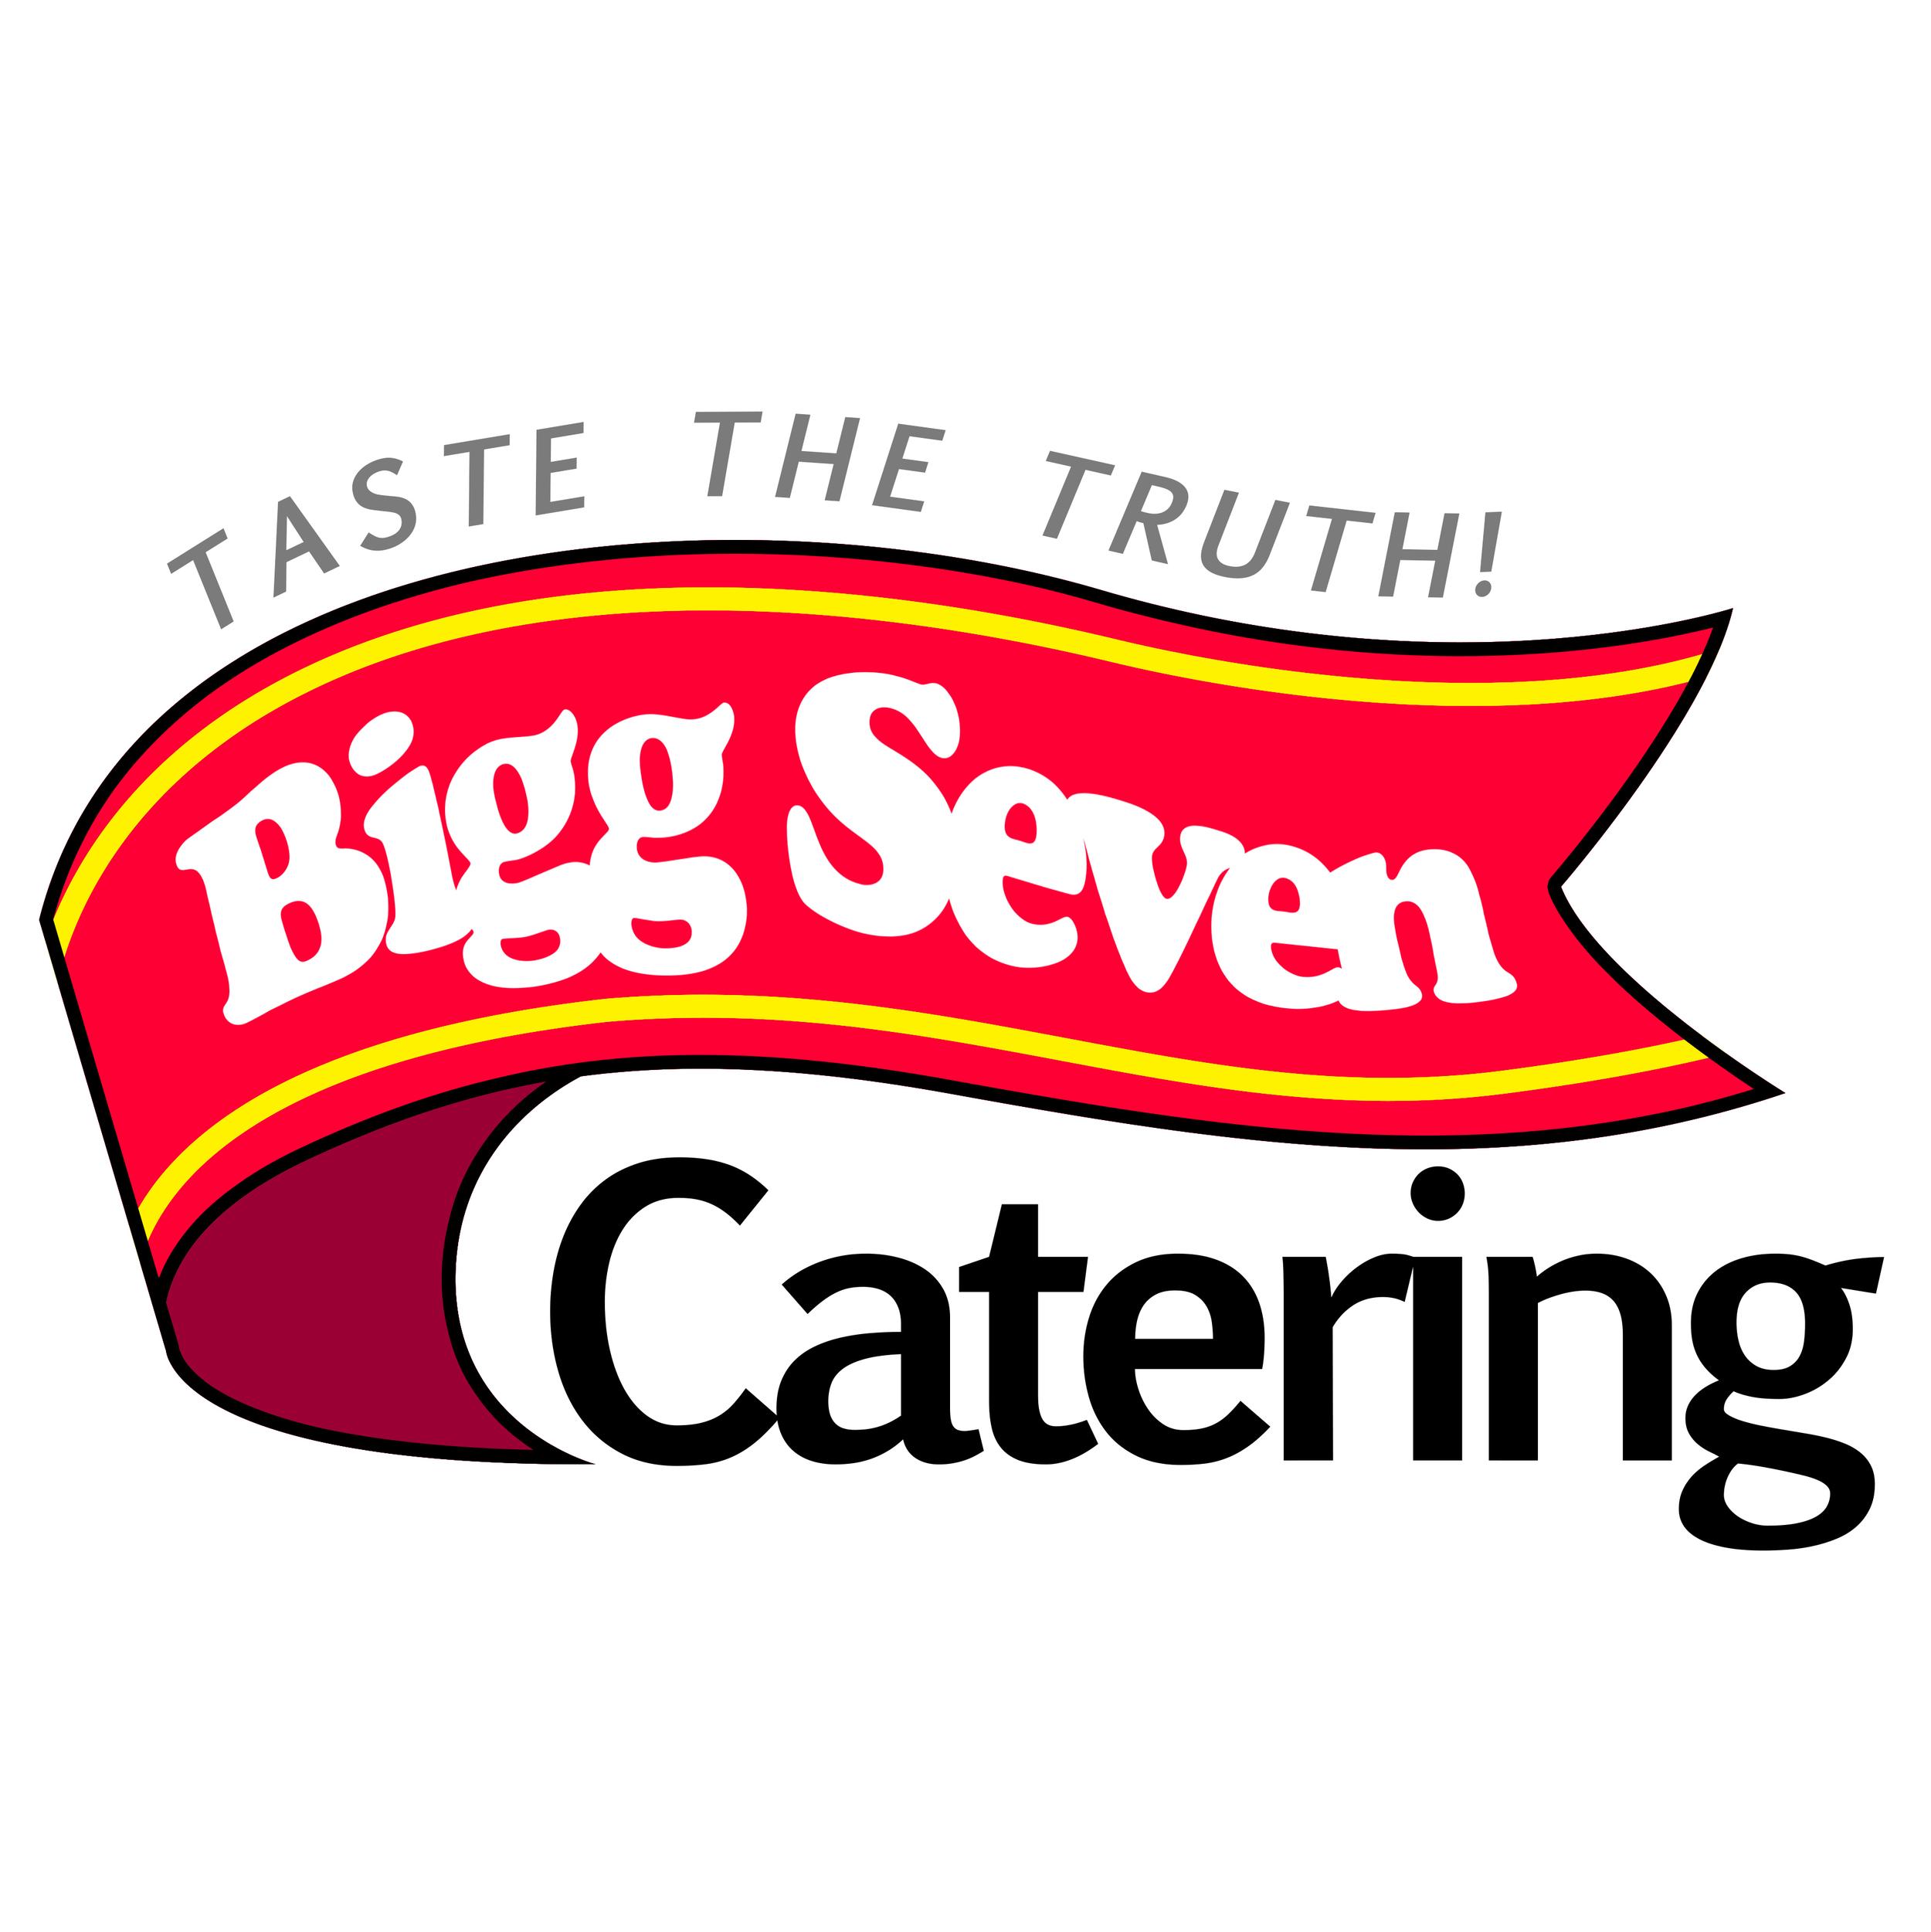 Bigg Seven Catering